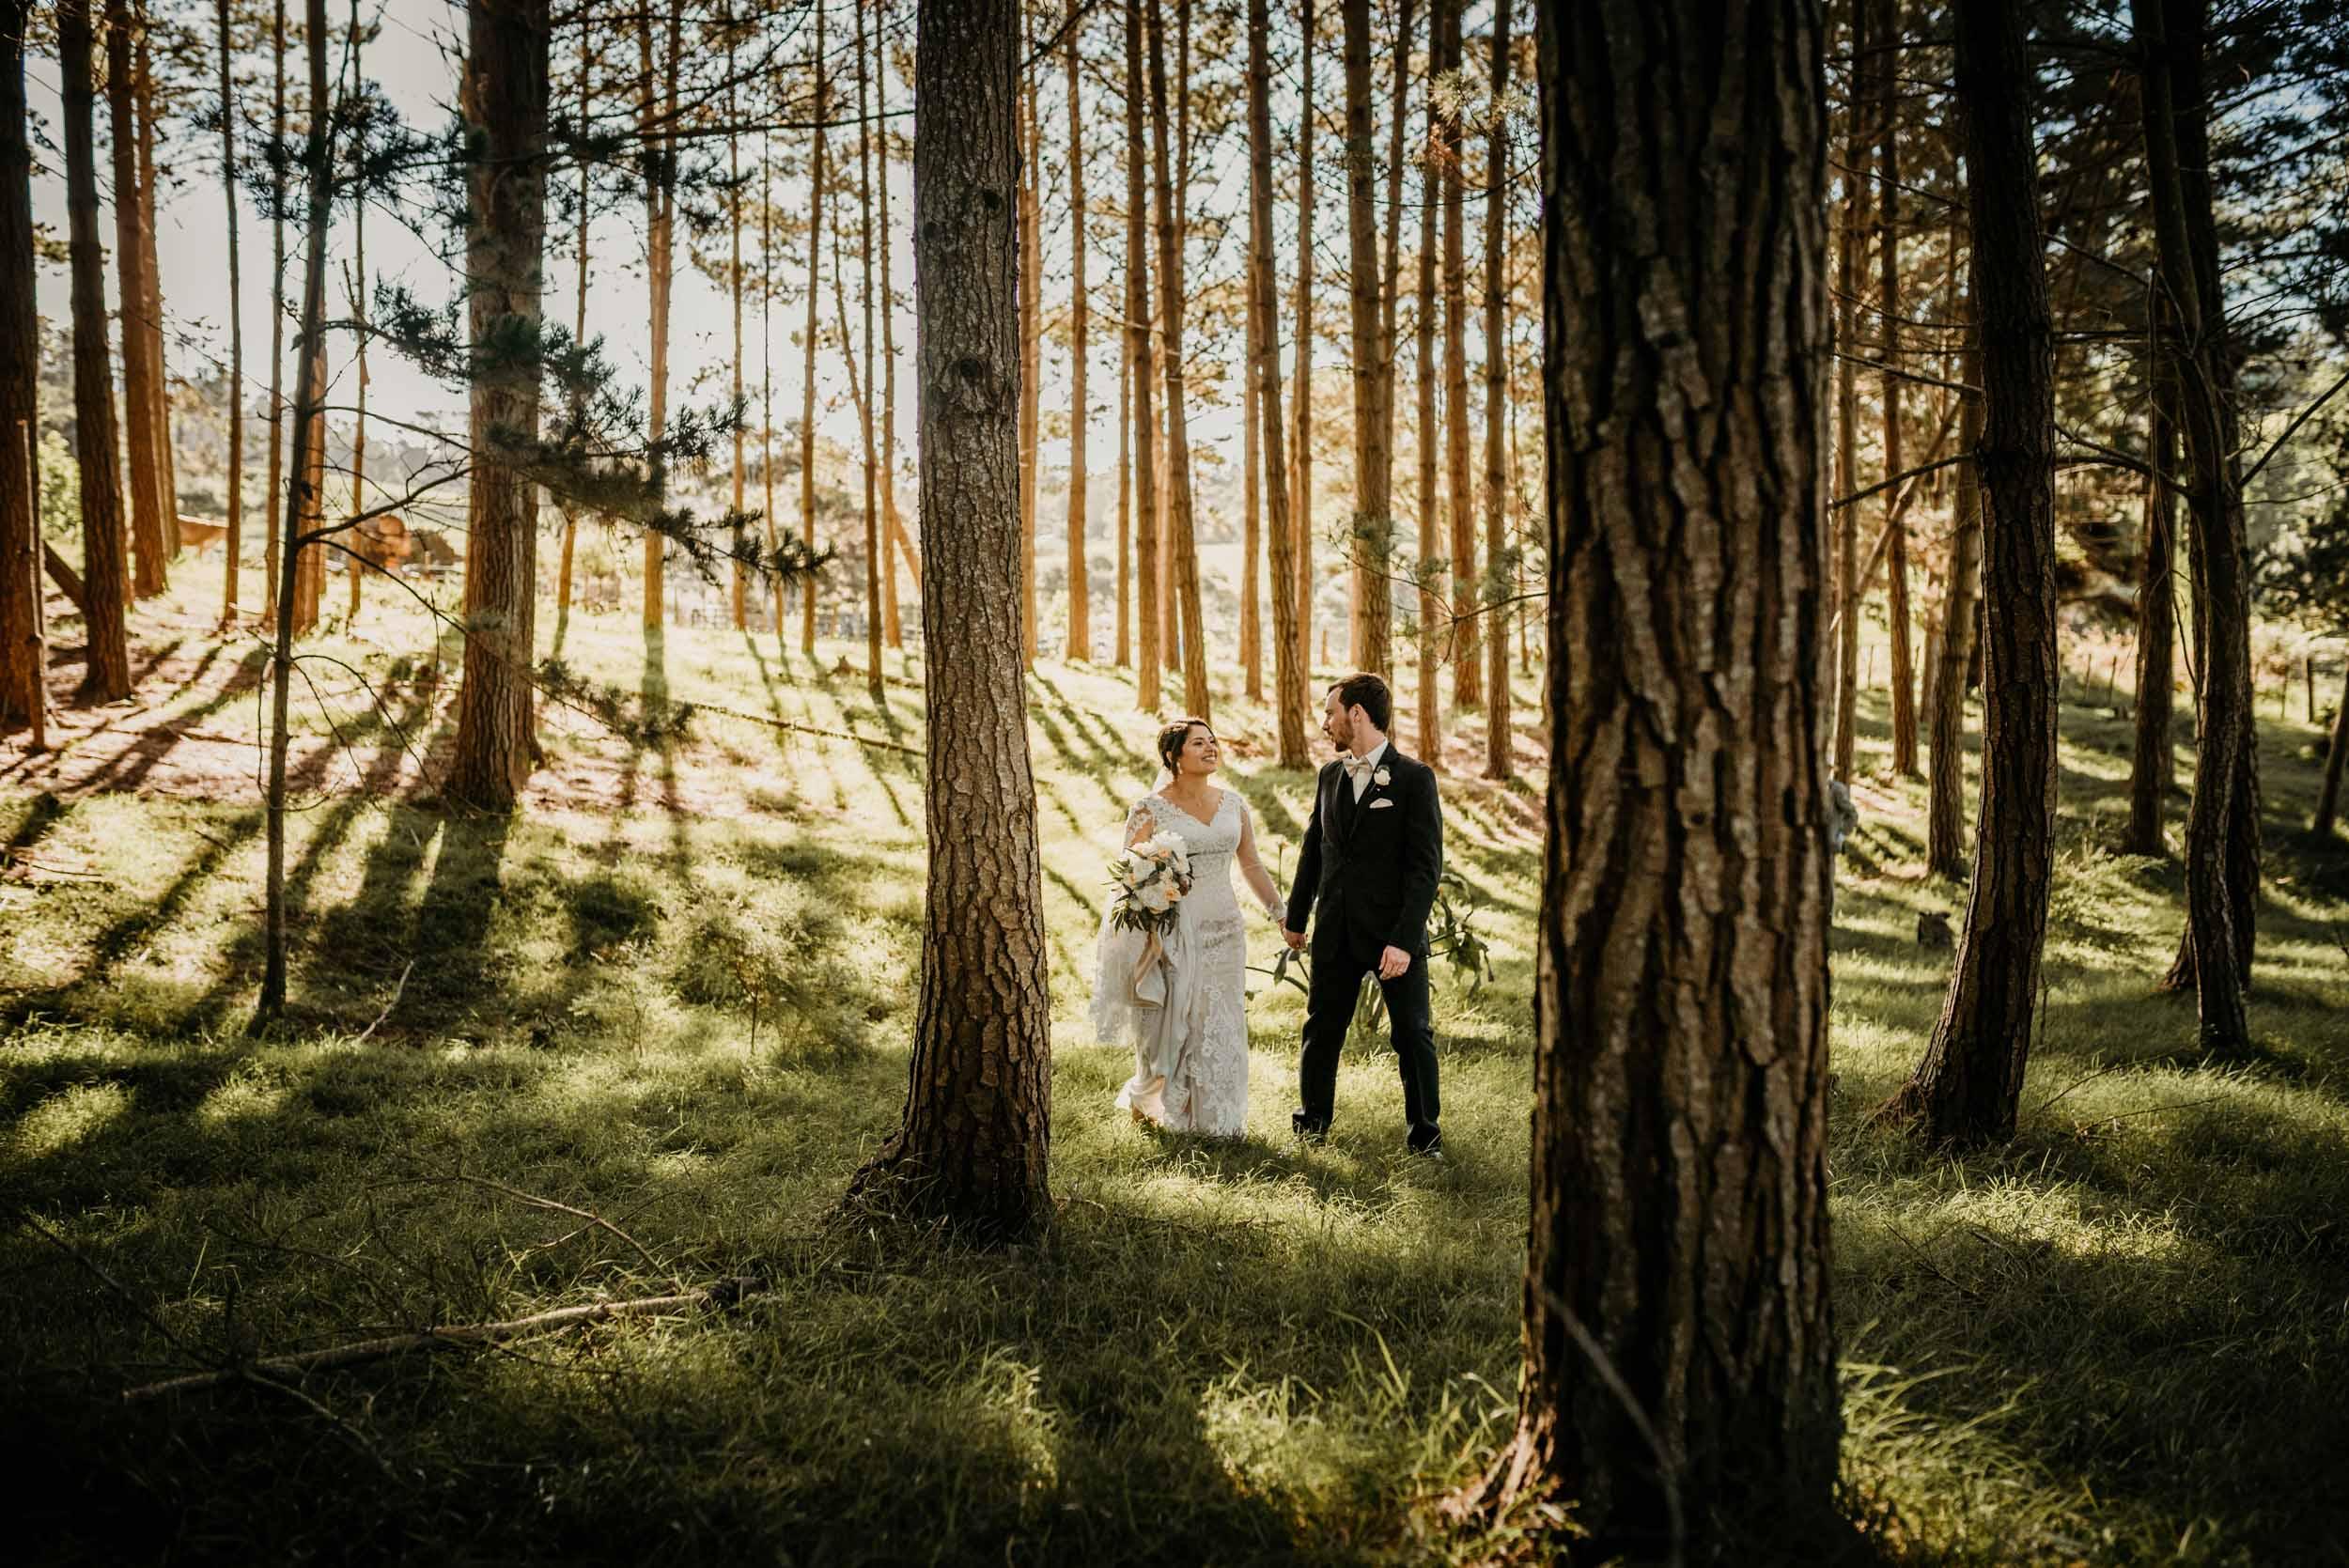 The Raw Photographer - Cairns Wedding Photographer - New Zealand Destination Photography - Travel - Australian-13.jpg